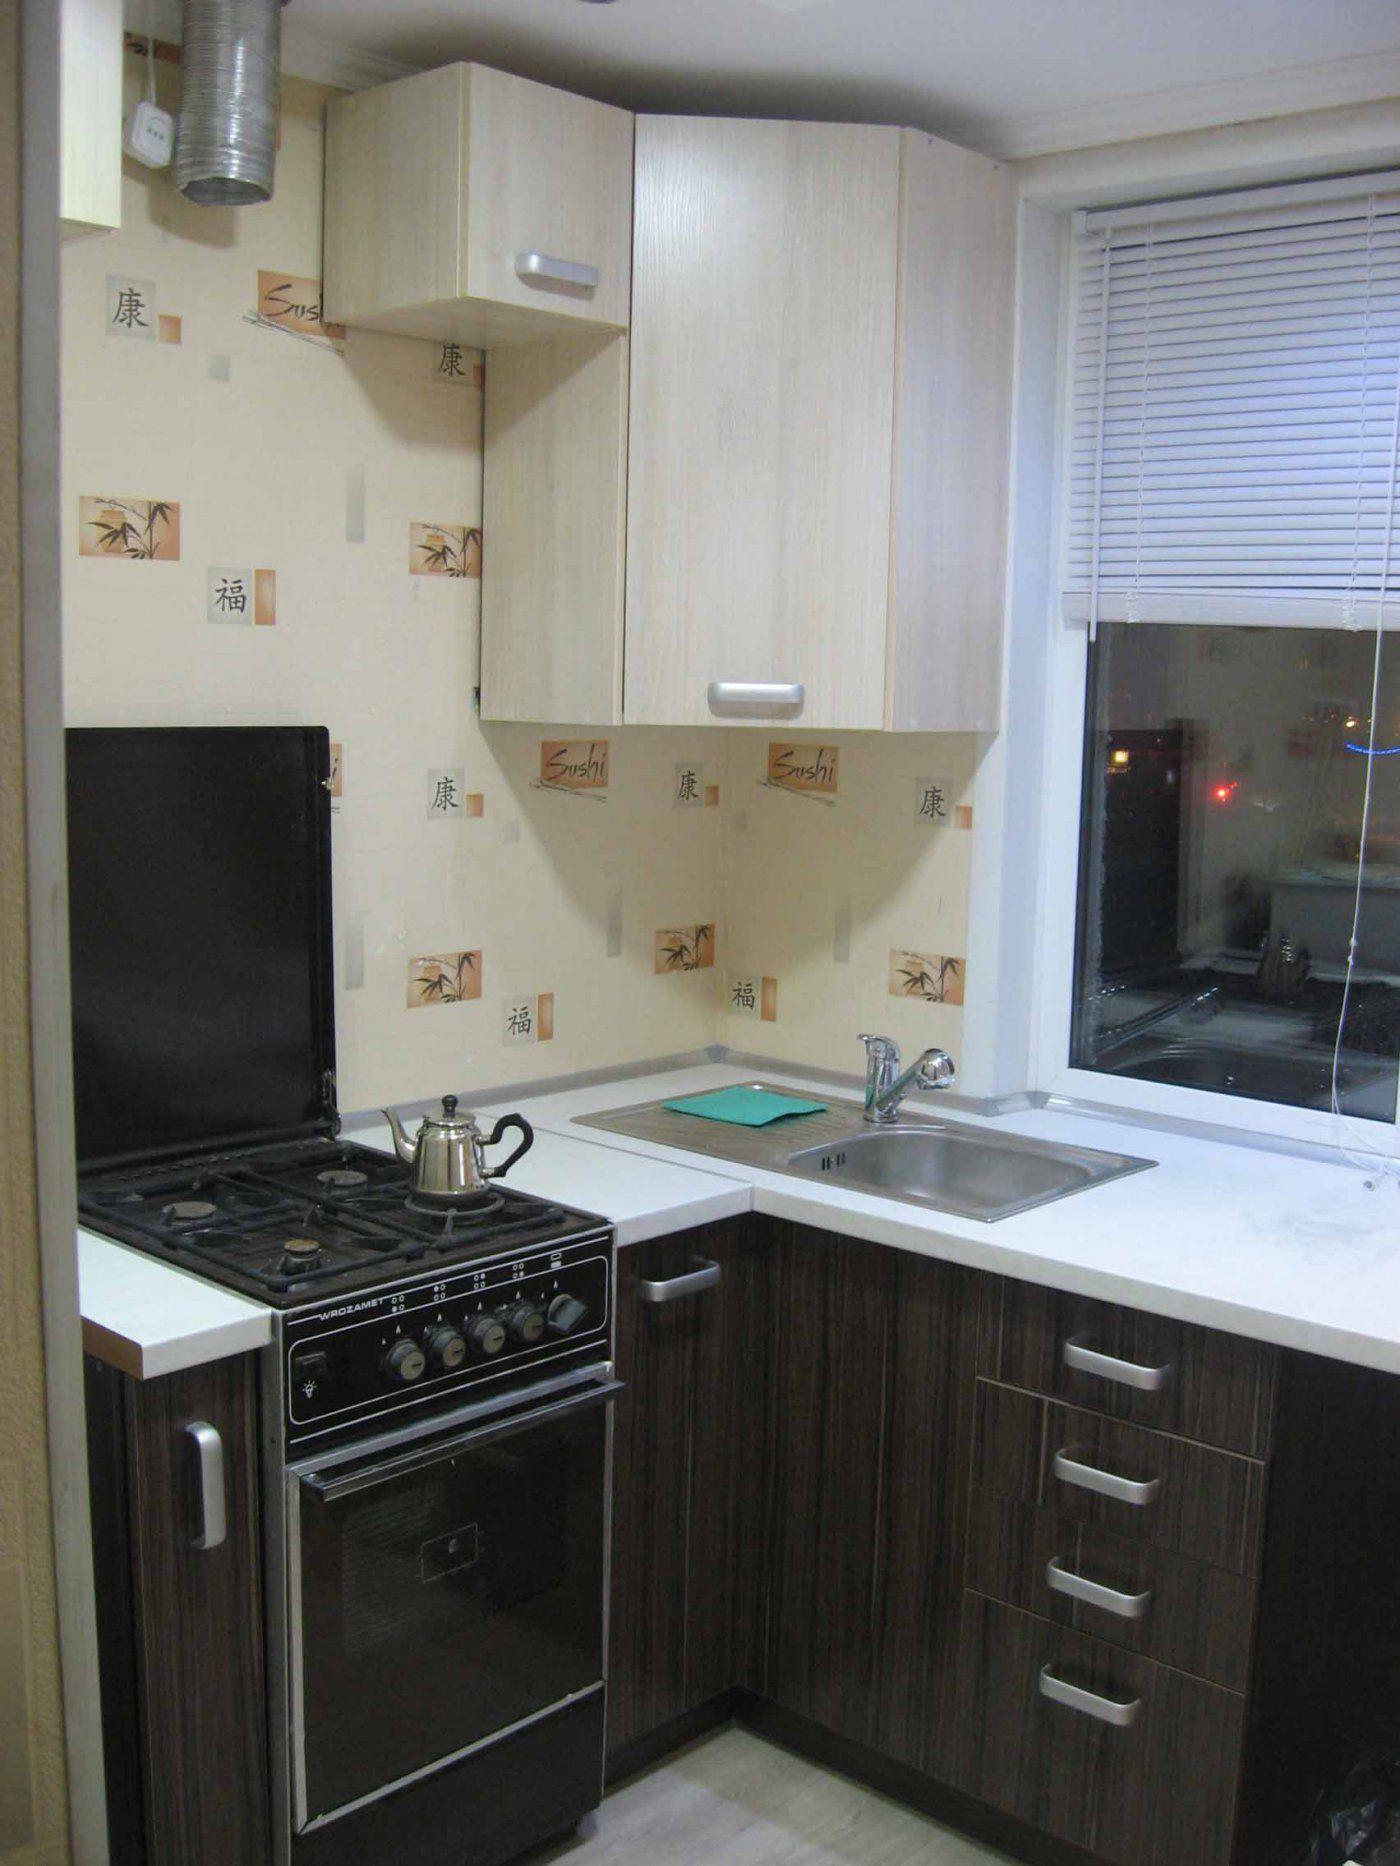 Кухни 5 кв м своими руками фото 773